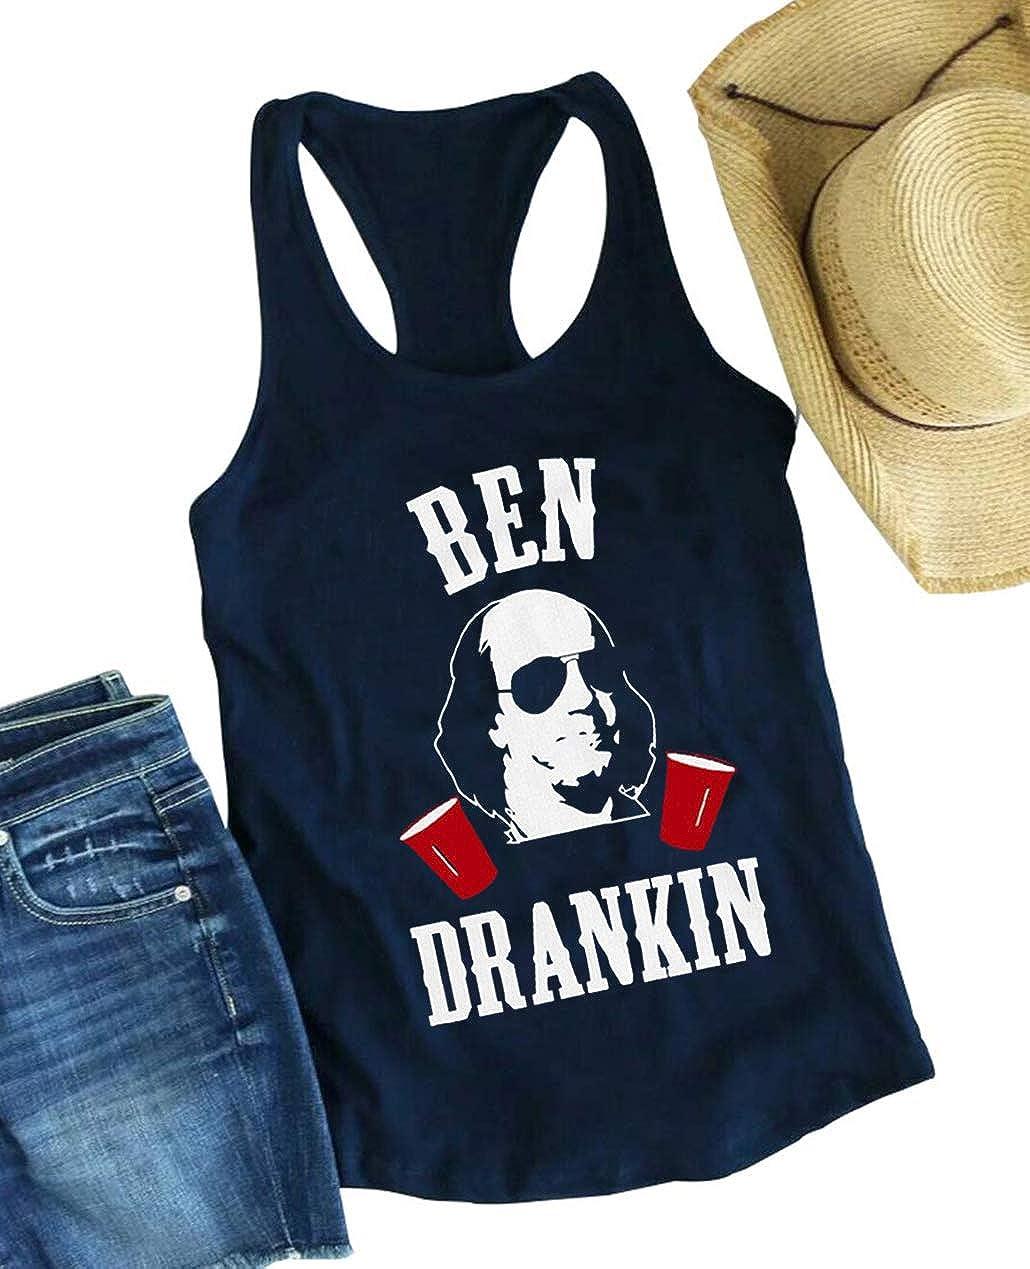 Drinkin Like Lincoln Tank Top Funny drunk July 4th patriotic Sleeveless Shirts